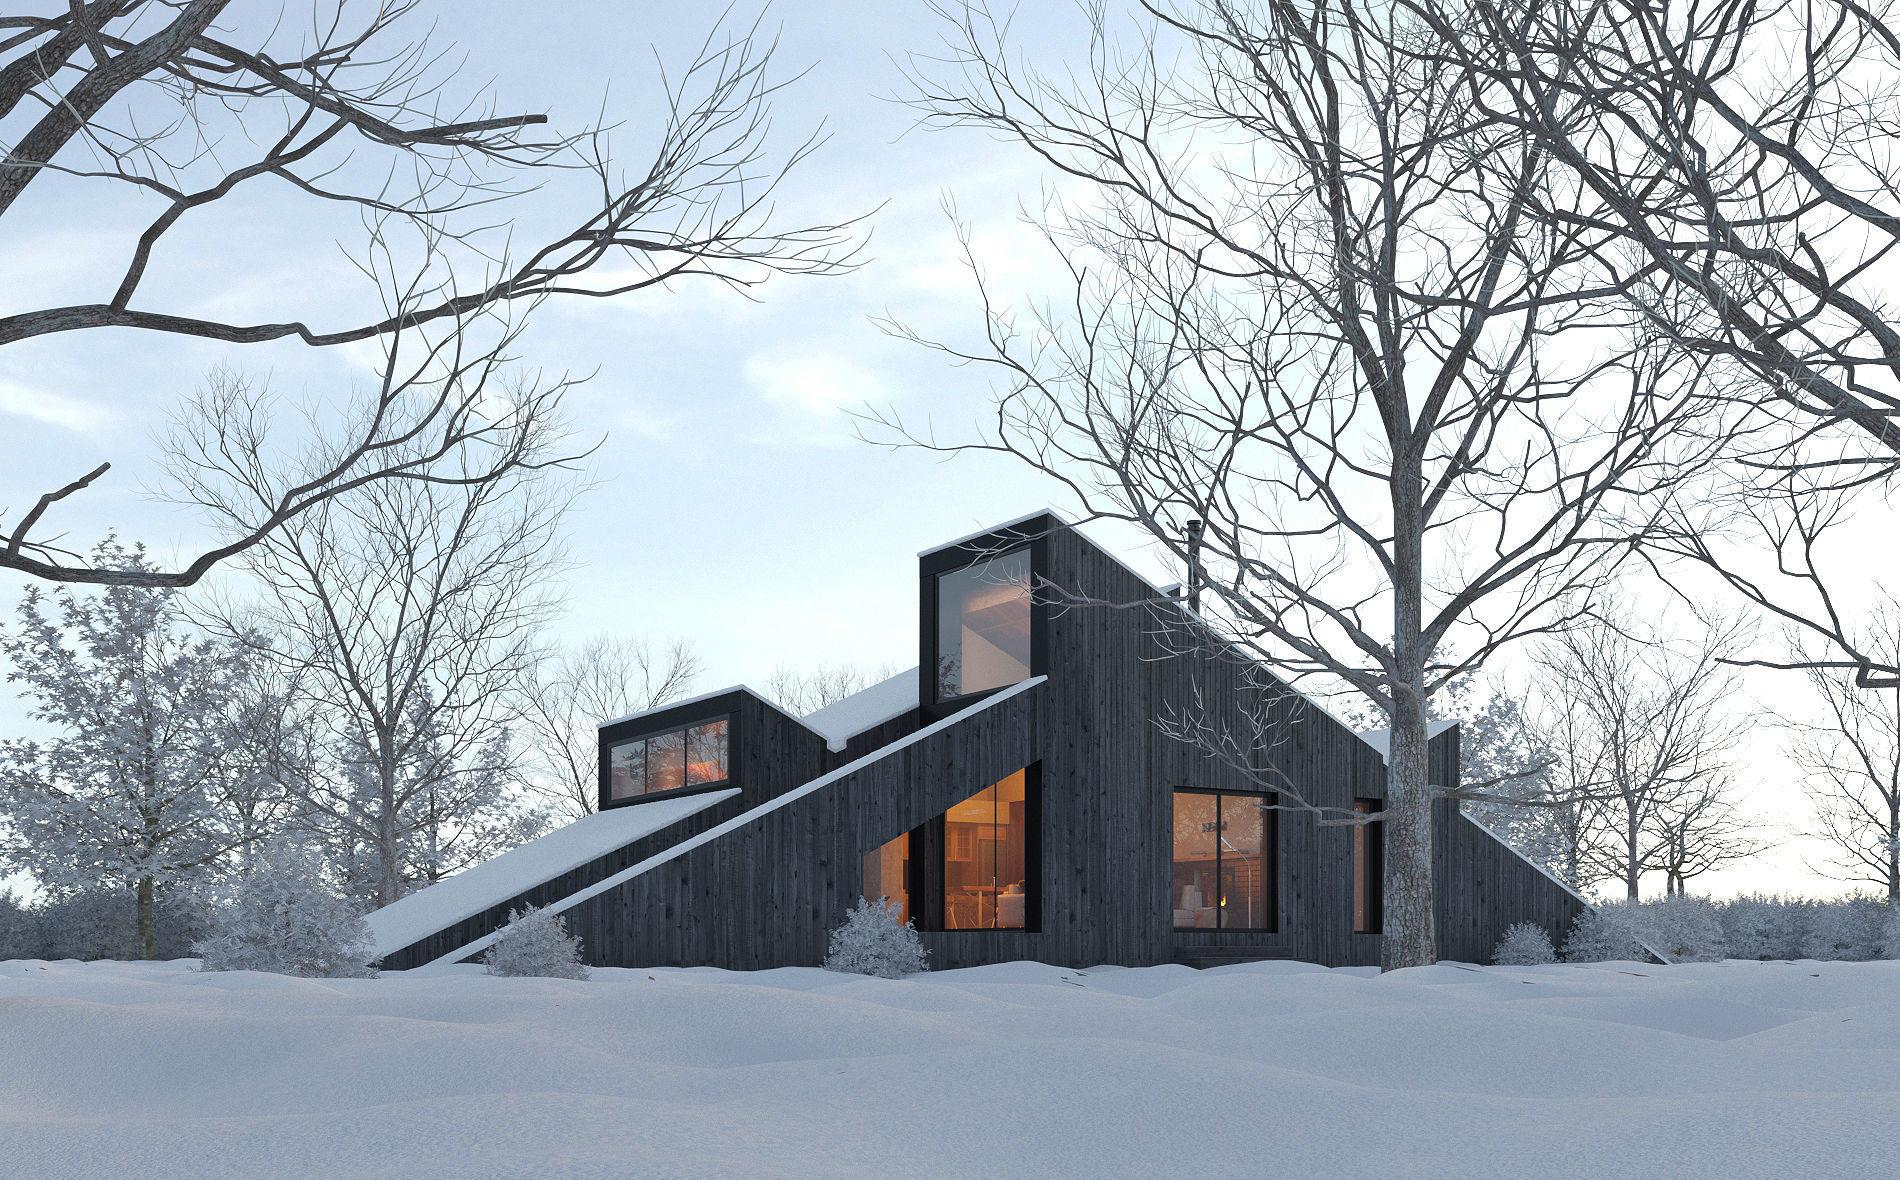 Winter Cabin House Exterior